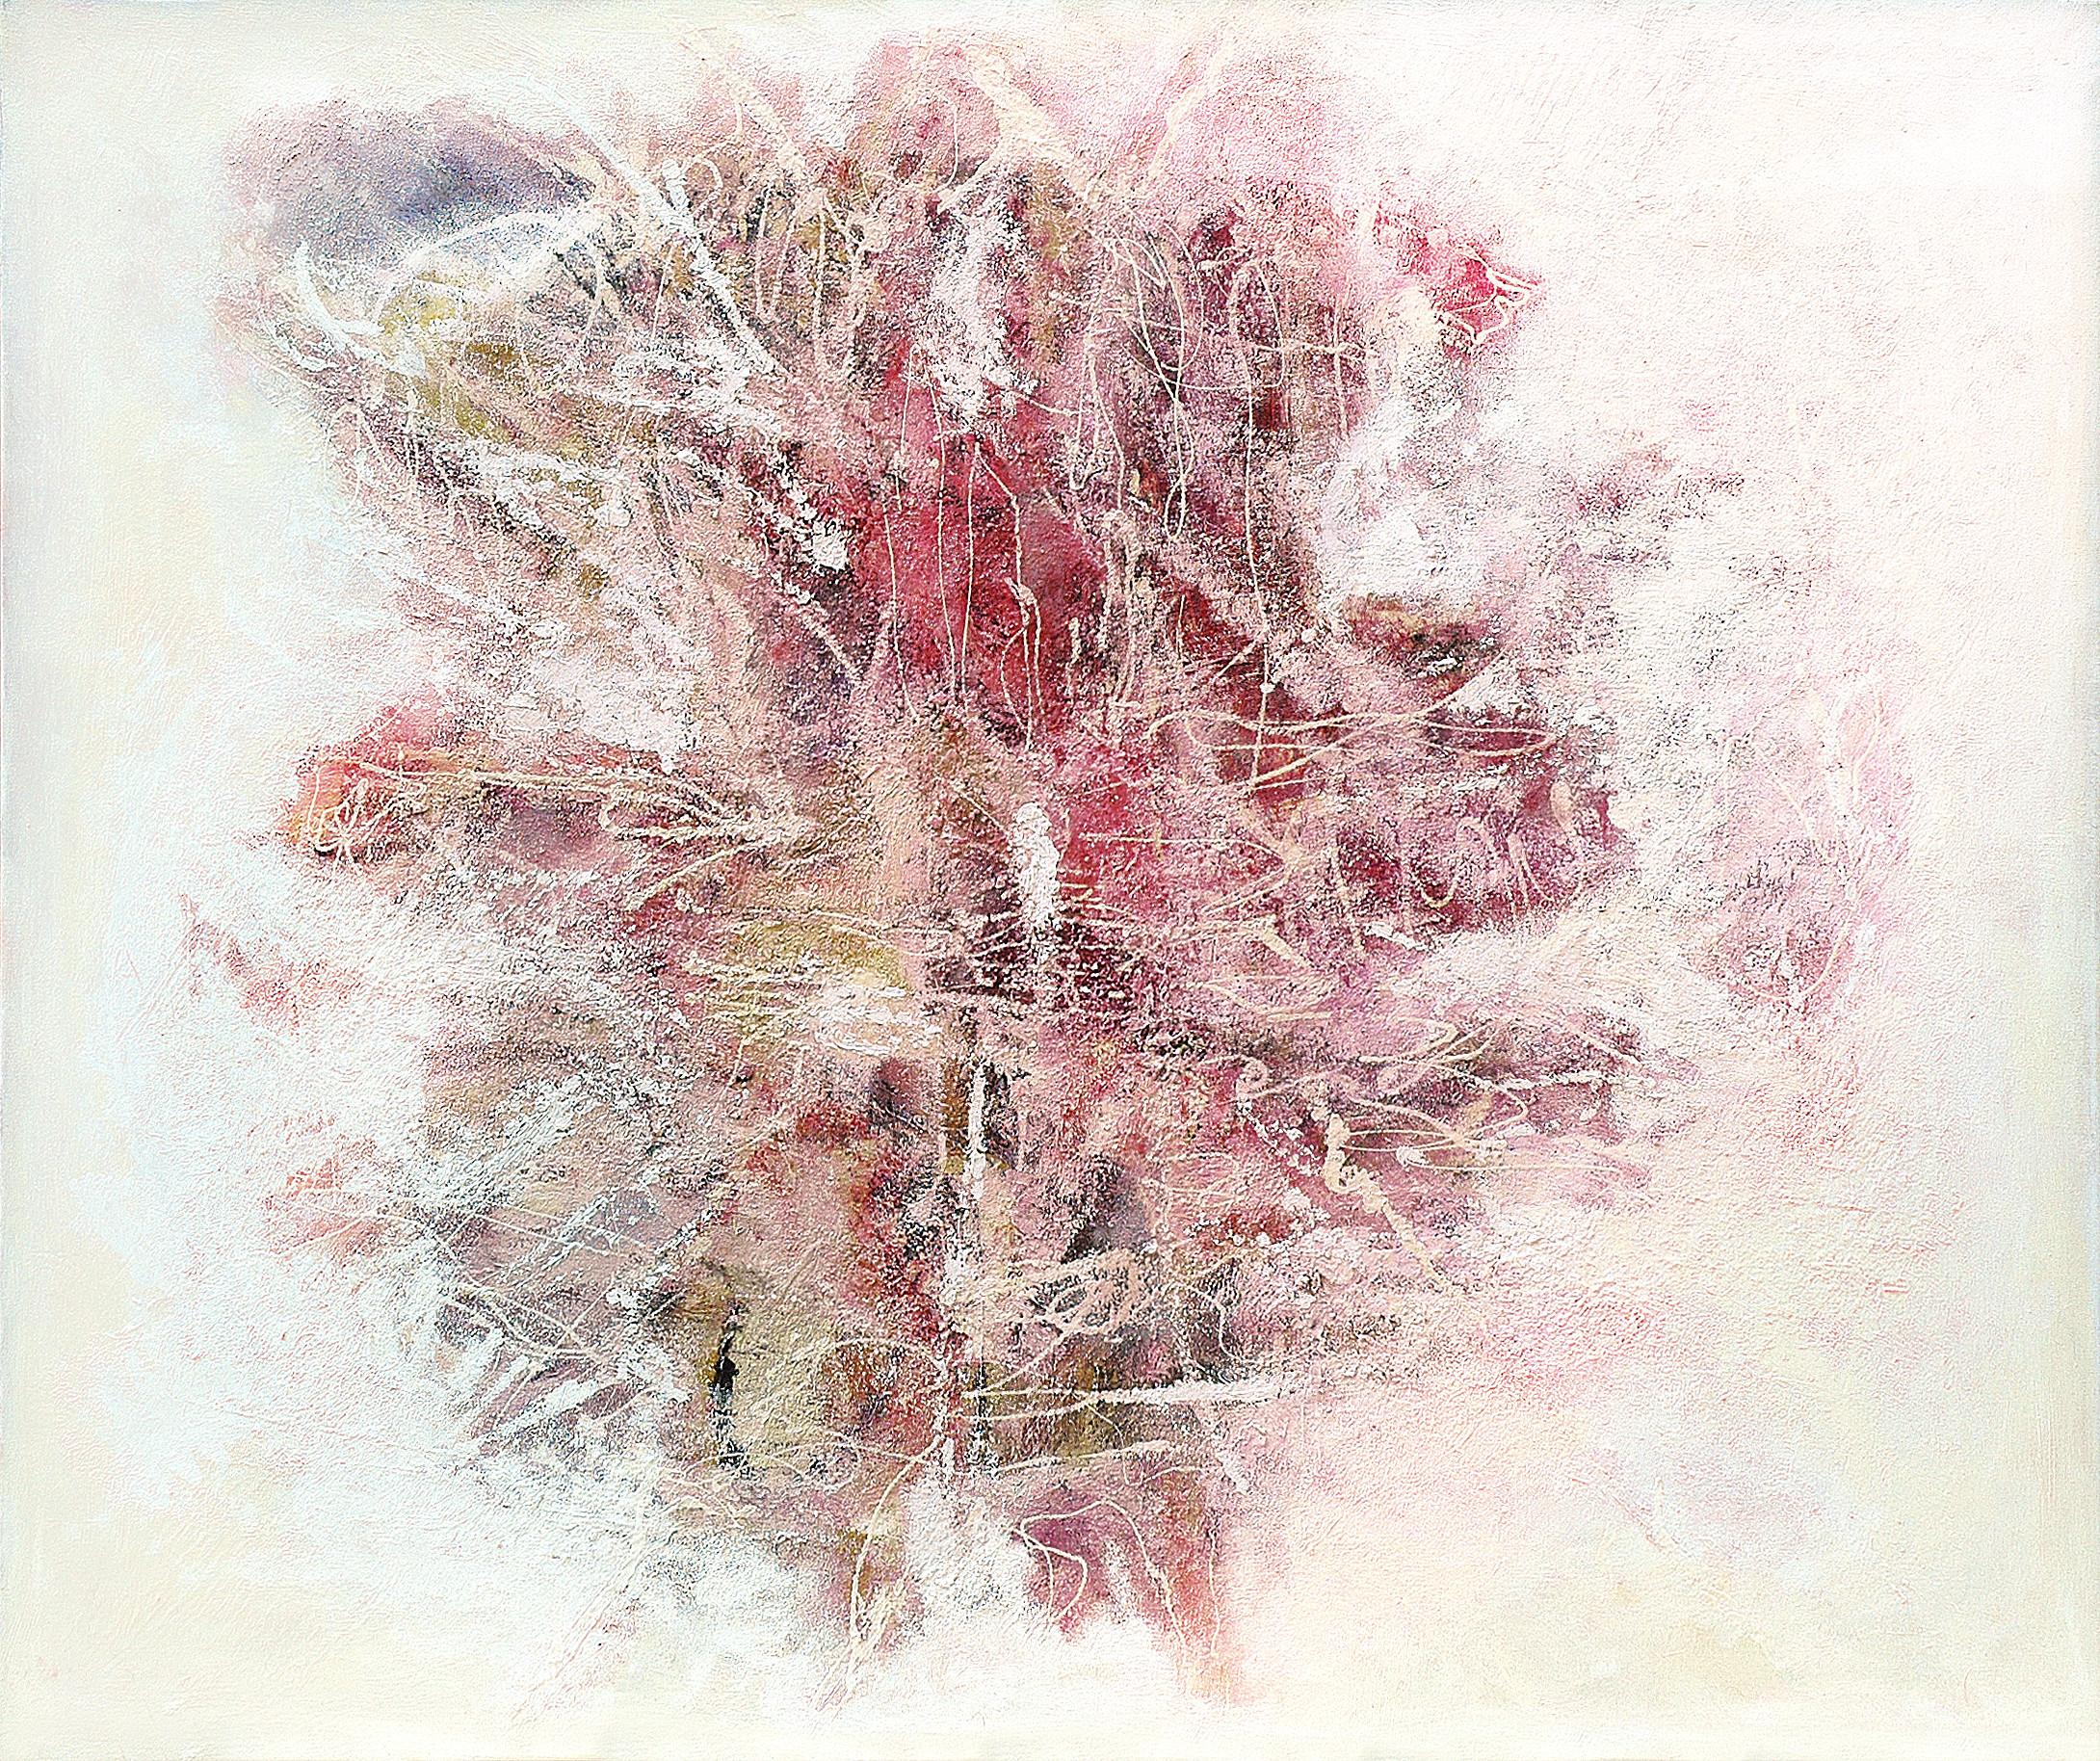 Carne_vale 100 x 120 oil varnish marble powder on canvas